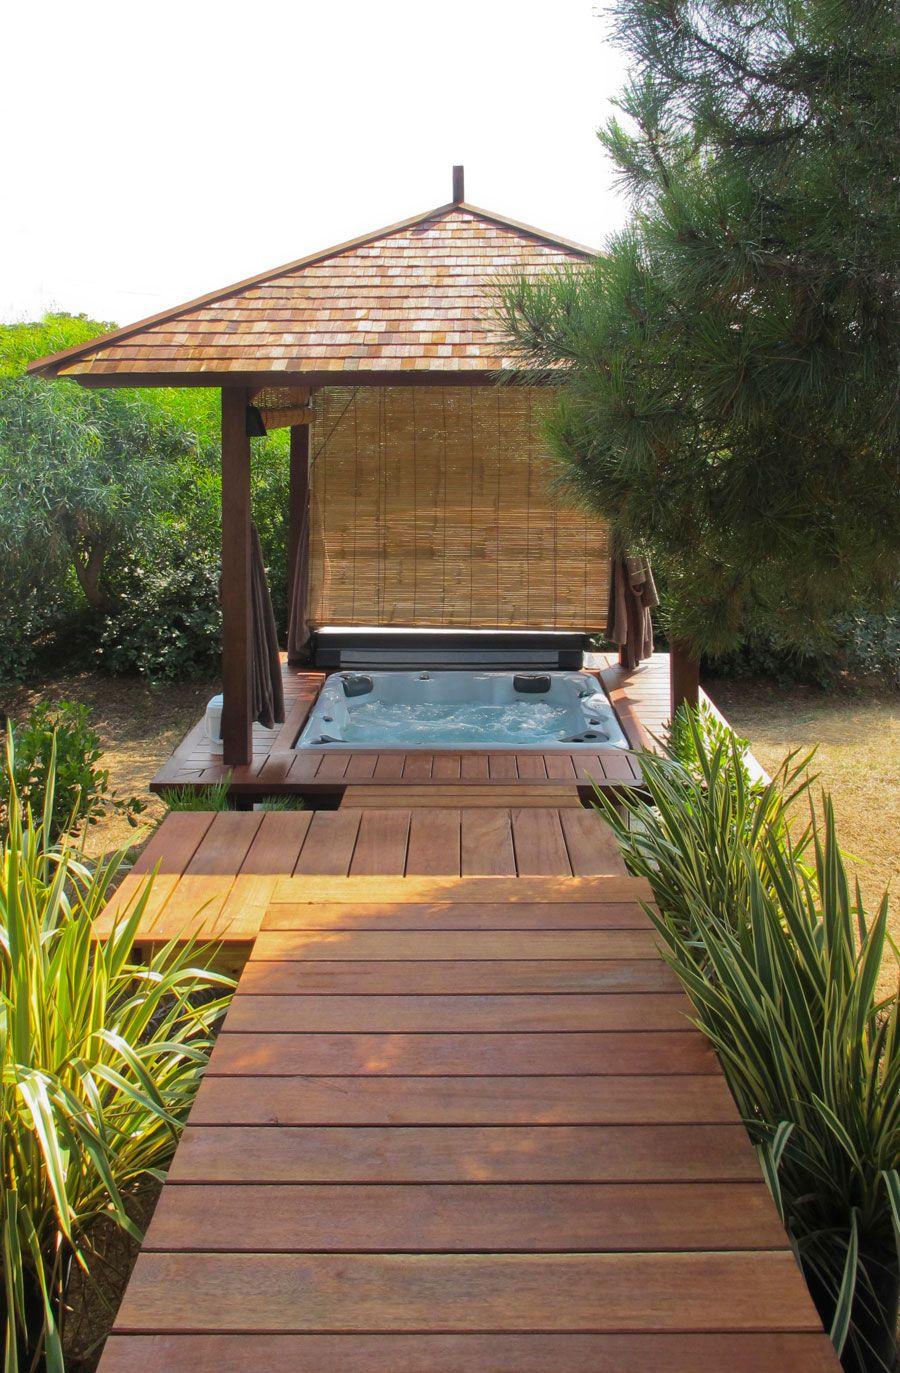 Jacuzzi int gr dans un gazebo en kit gardening jacuzzi outdoor hot tub gazebo et jacuzzi - Piscine spa integre ...